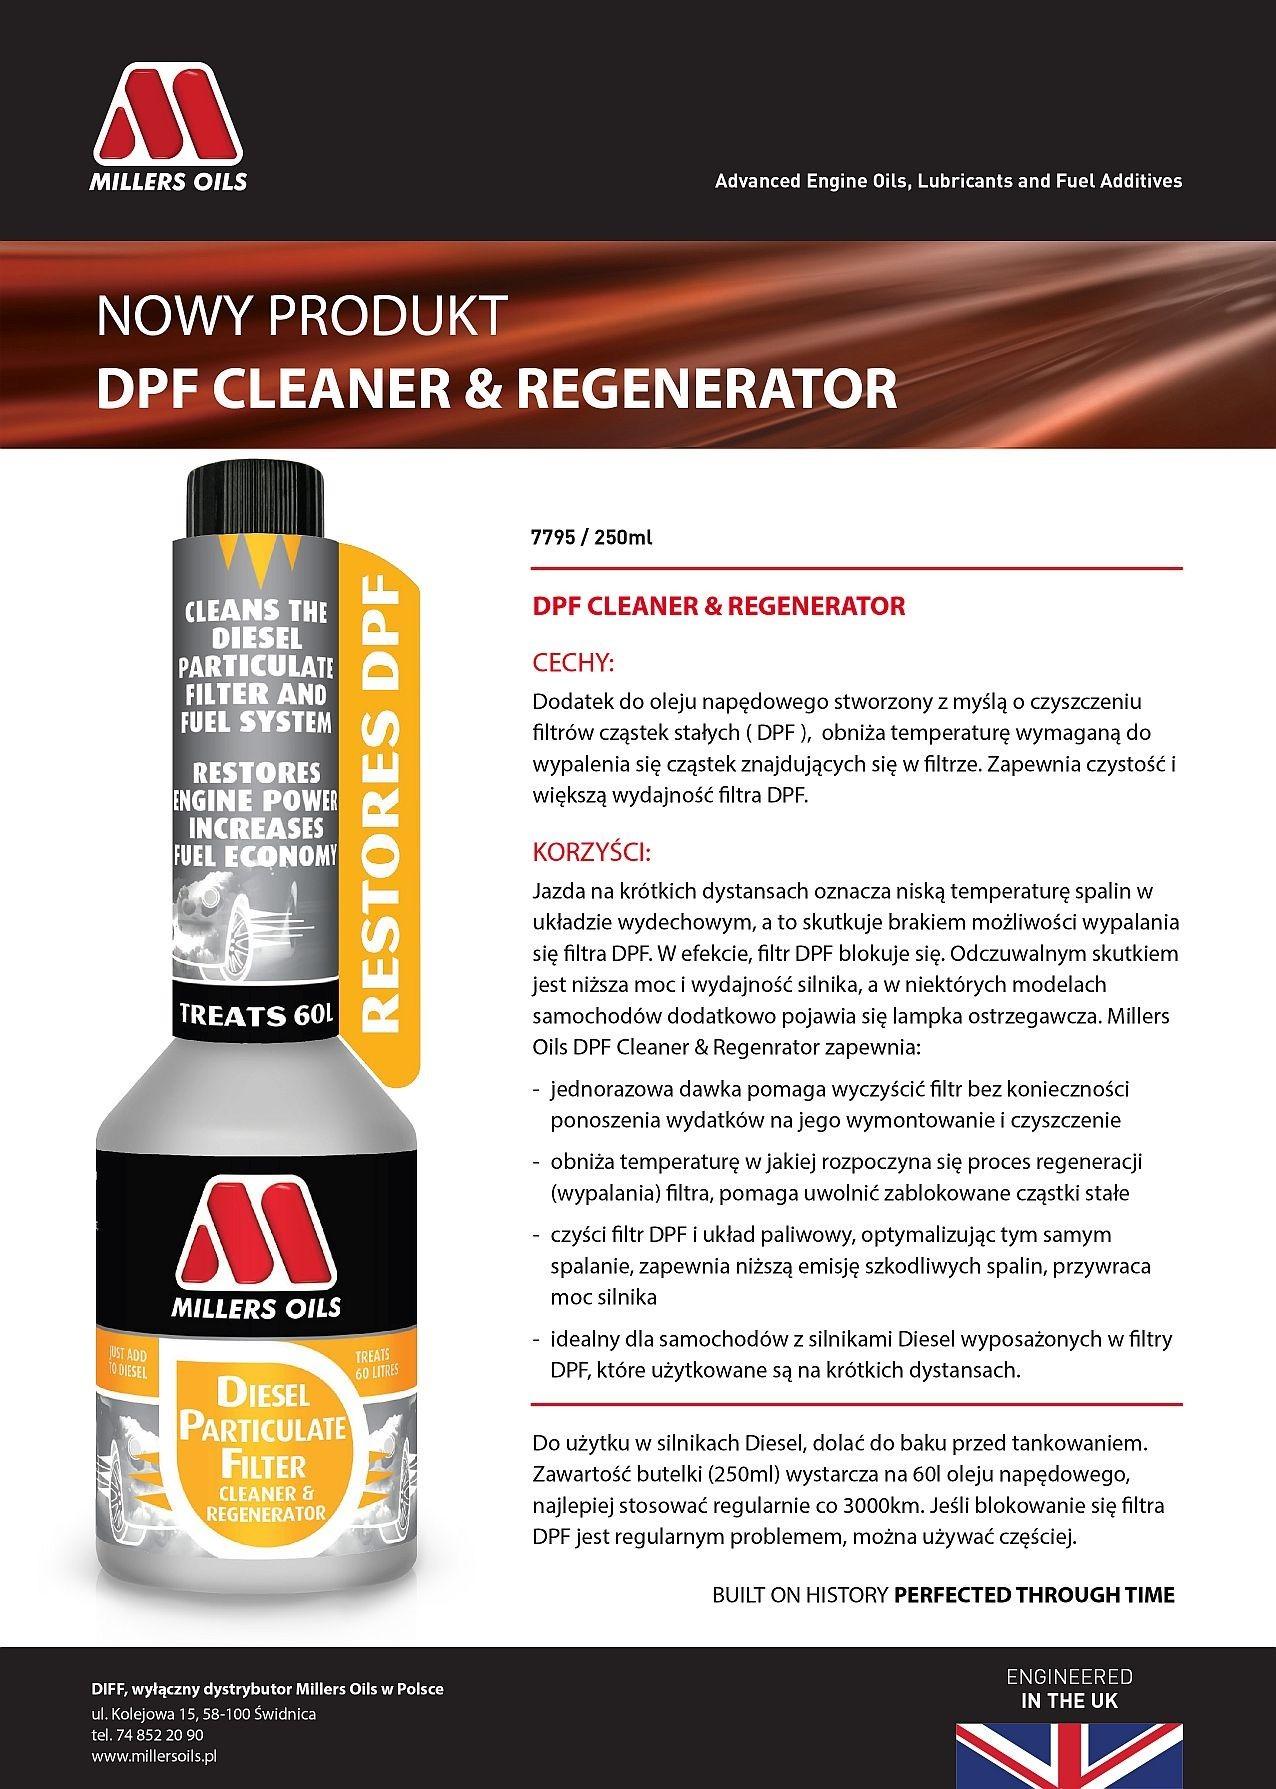 Millers Oils DPF Cleaner & Regenrator 250ml